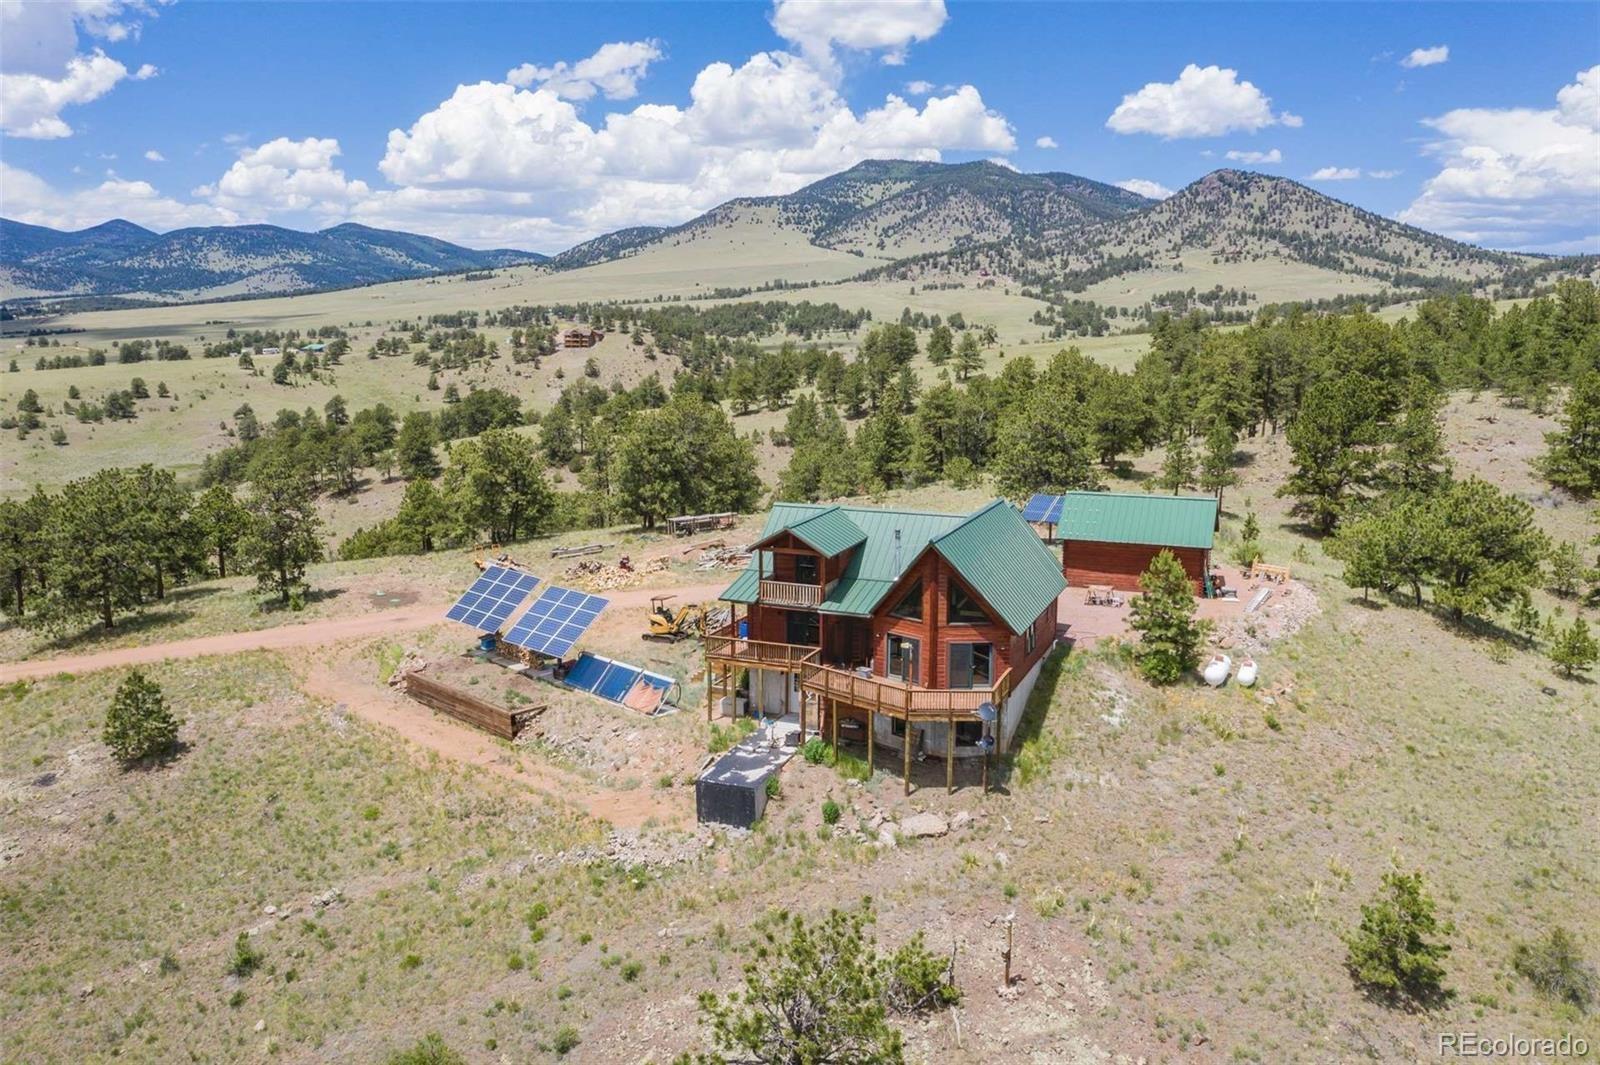 MLS# 8182693 - 1 - 396 Eagle Nest Trail, Guffey, CO 80820